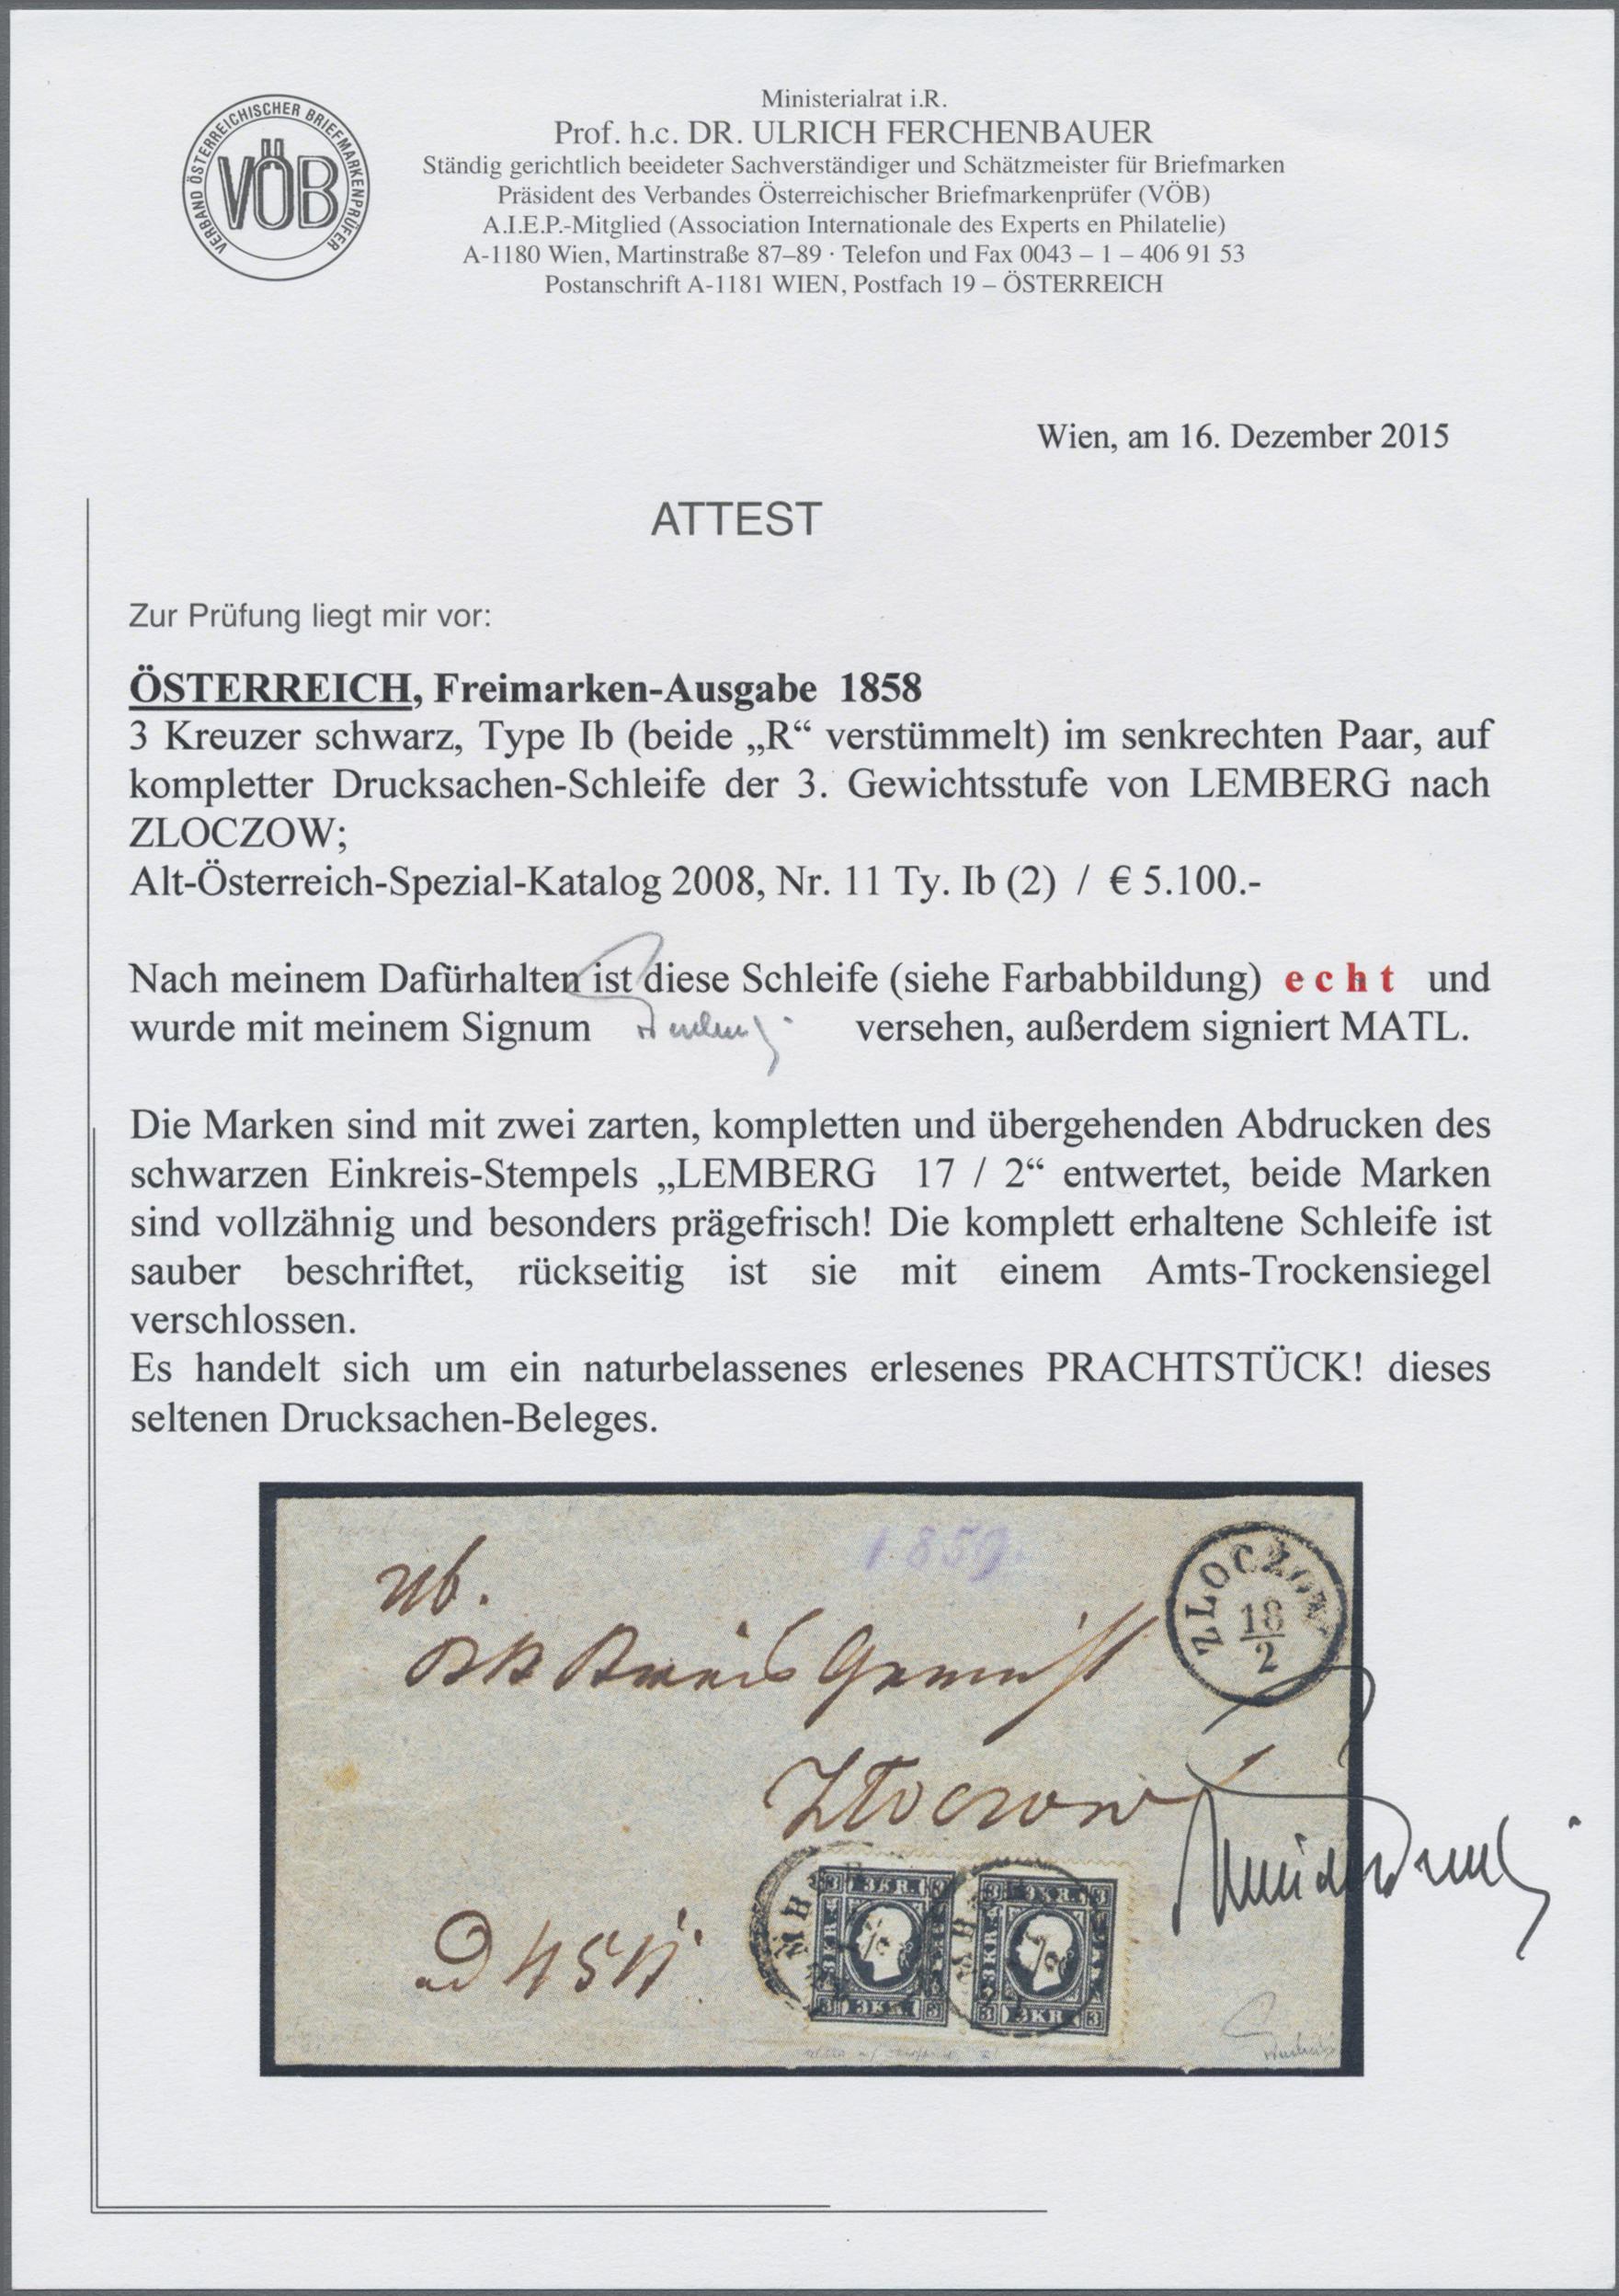 Lot 09492 - österreich  -  Auktionshaus Christoph Gärtner GmbH & Co. KG Sale #48 The Single Lots Philatelie